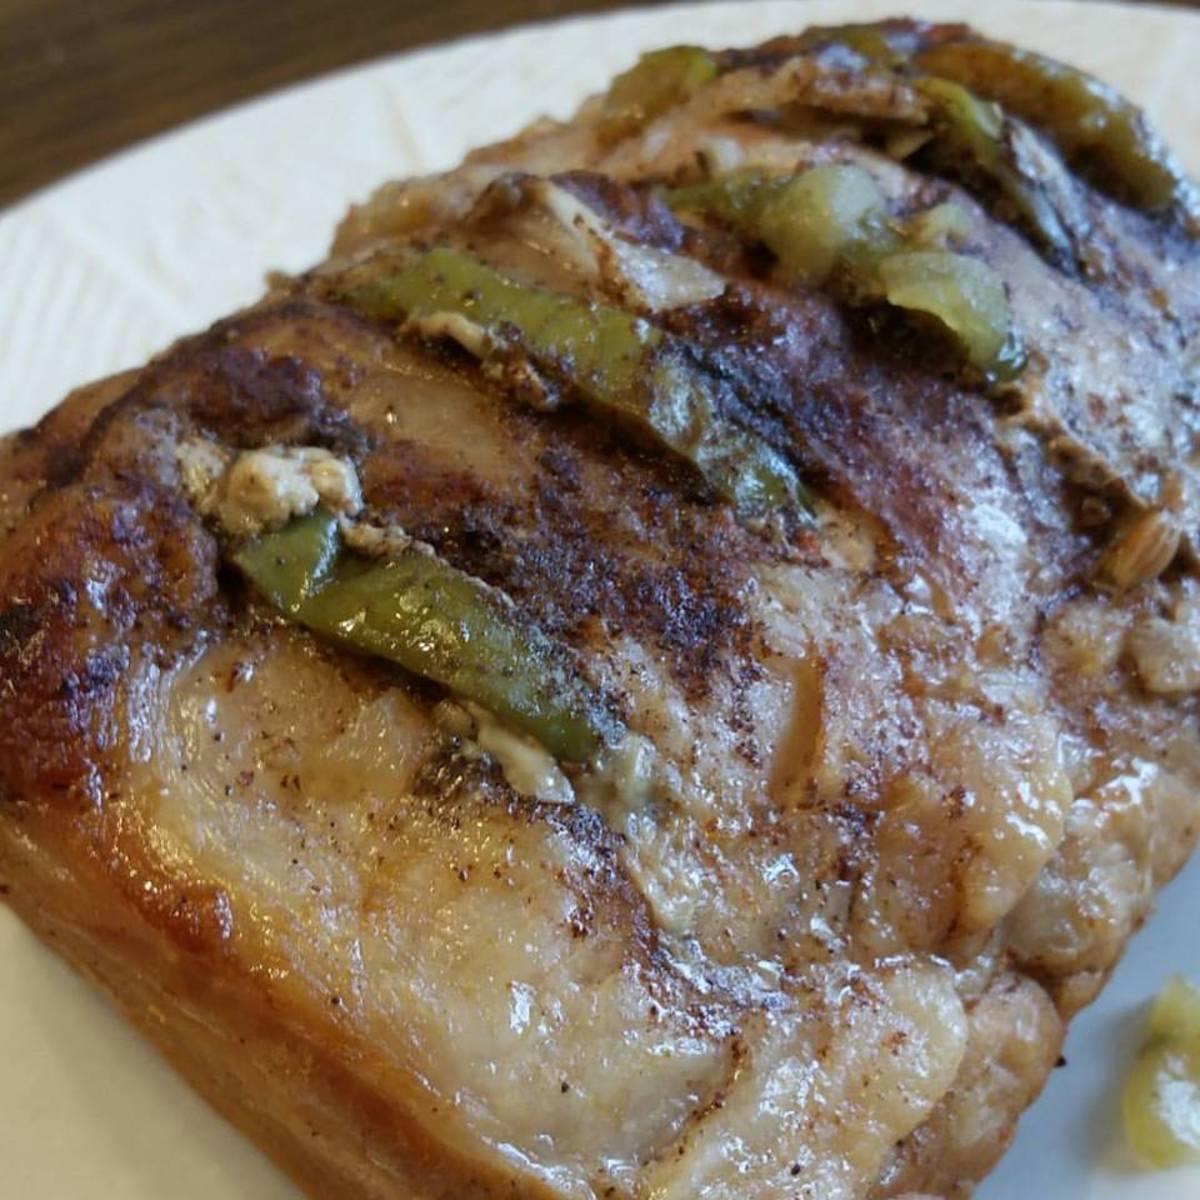 honey apple pork roast: Isn't she a beauty?